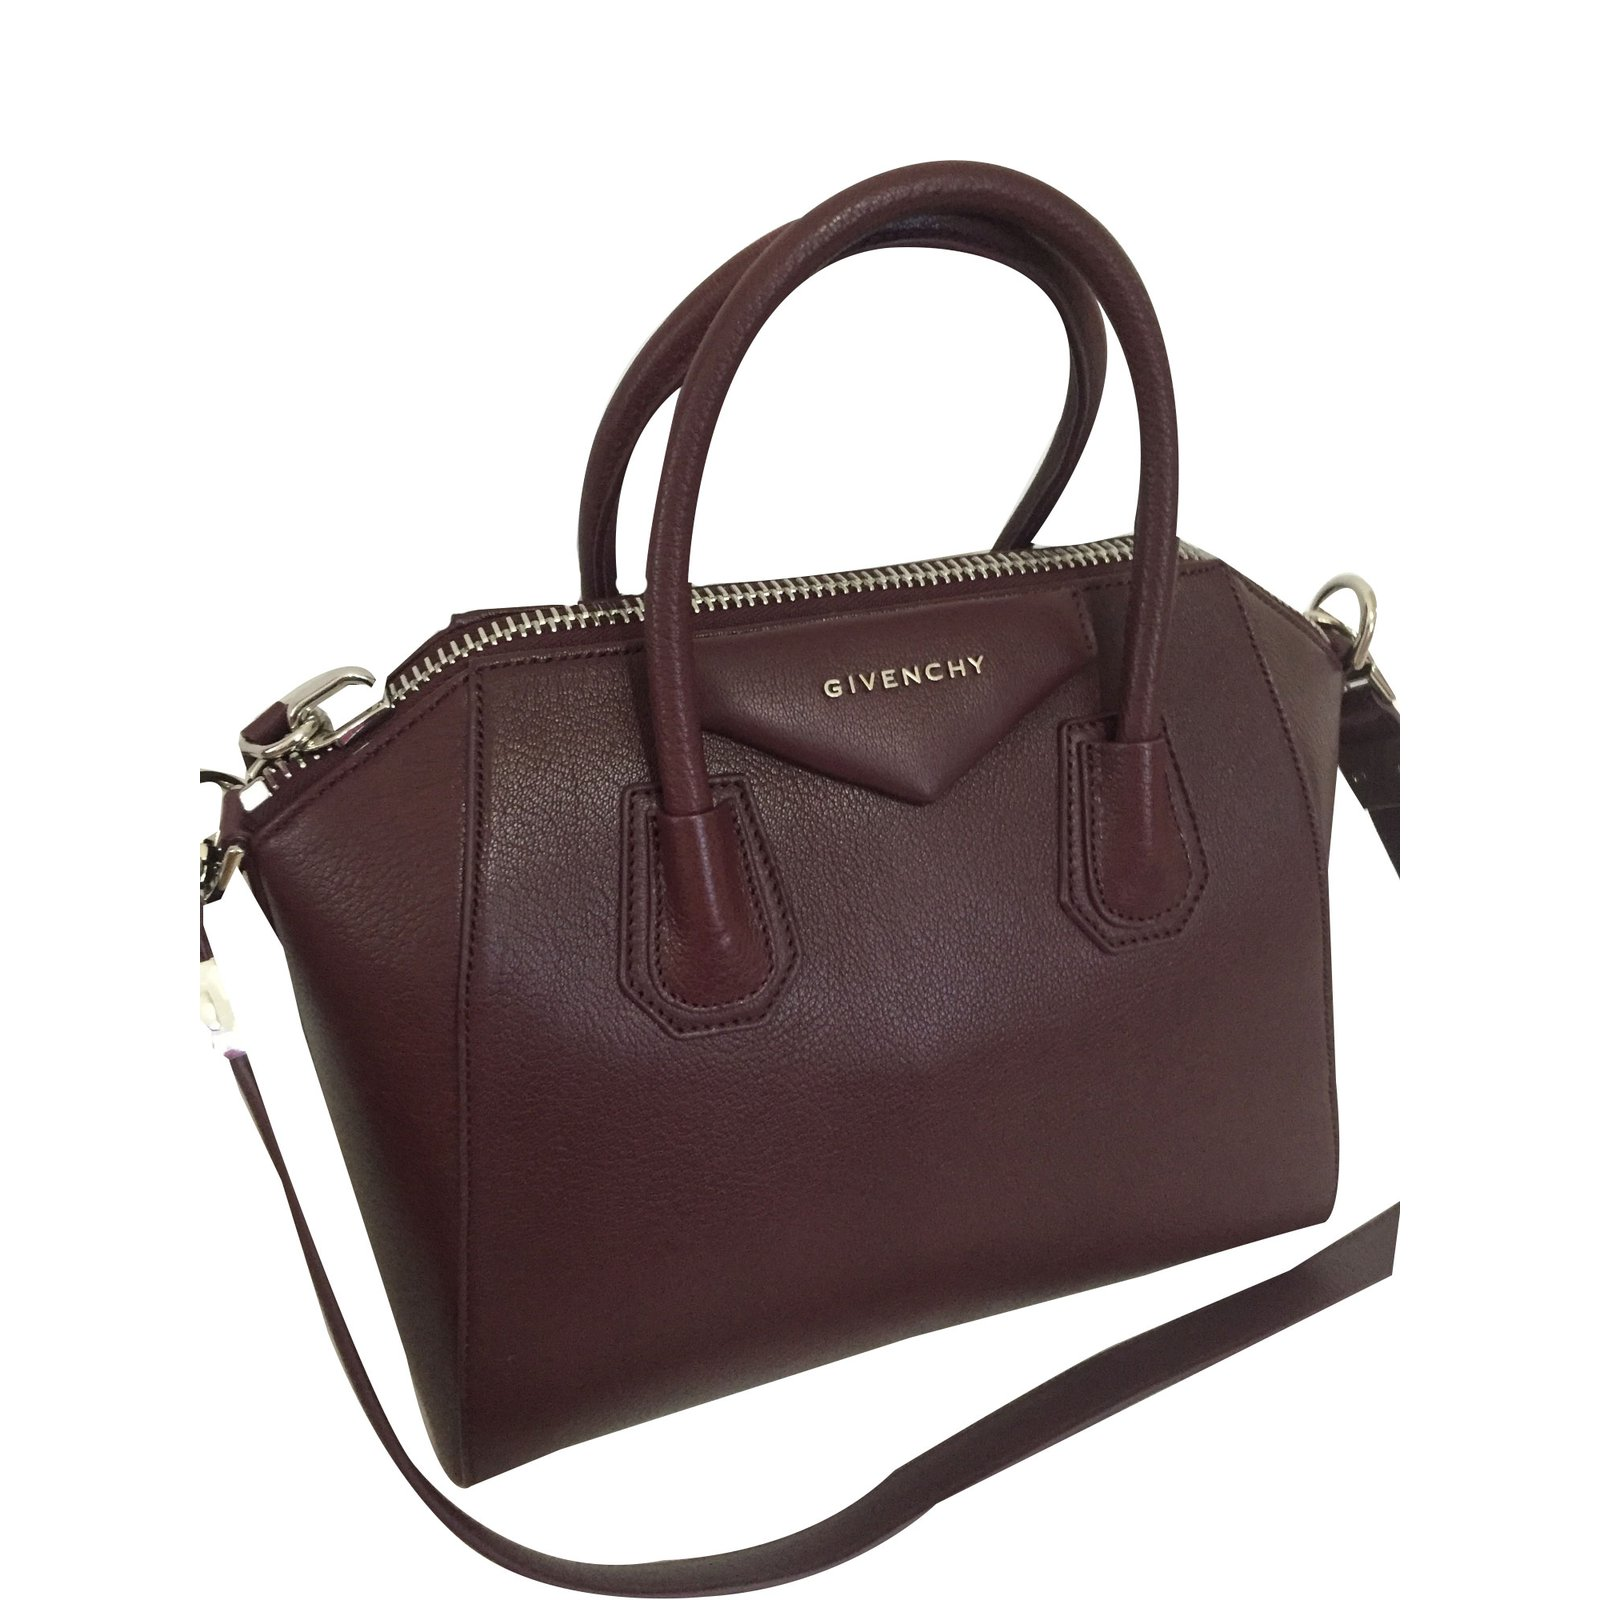 sacs main givenchy sacs main cuir marron joli closet. Black Bedroom Furniture Sets. Home Design Ideas